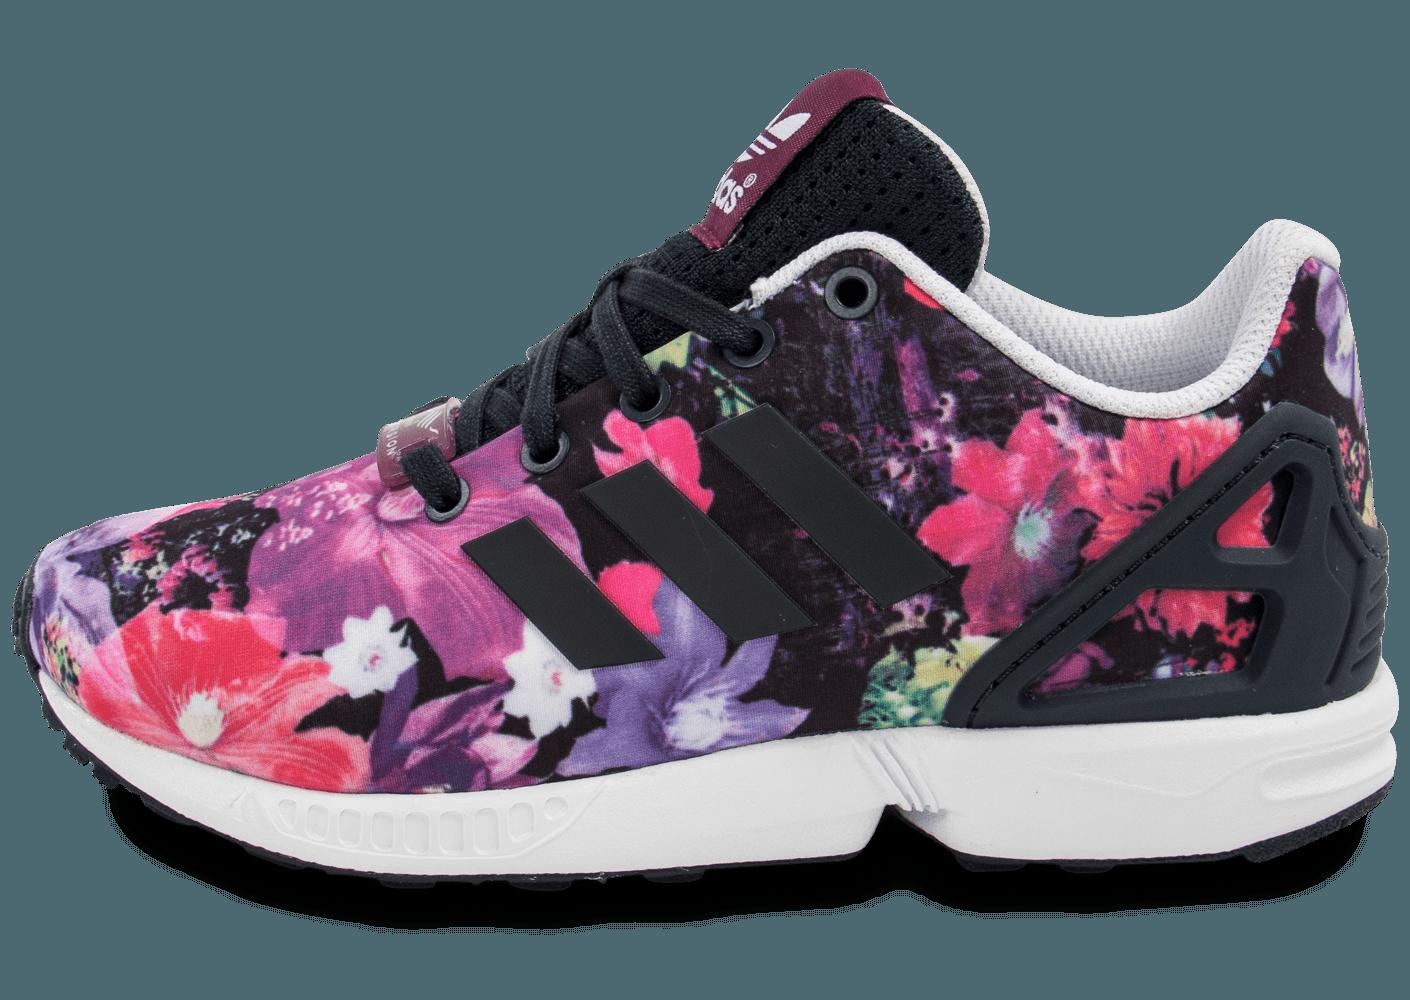 A Acheter Fleur Pas Chaussure Cher Adidas Zqatxwf Padding